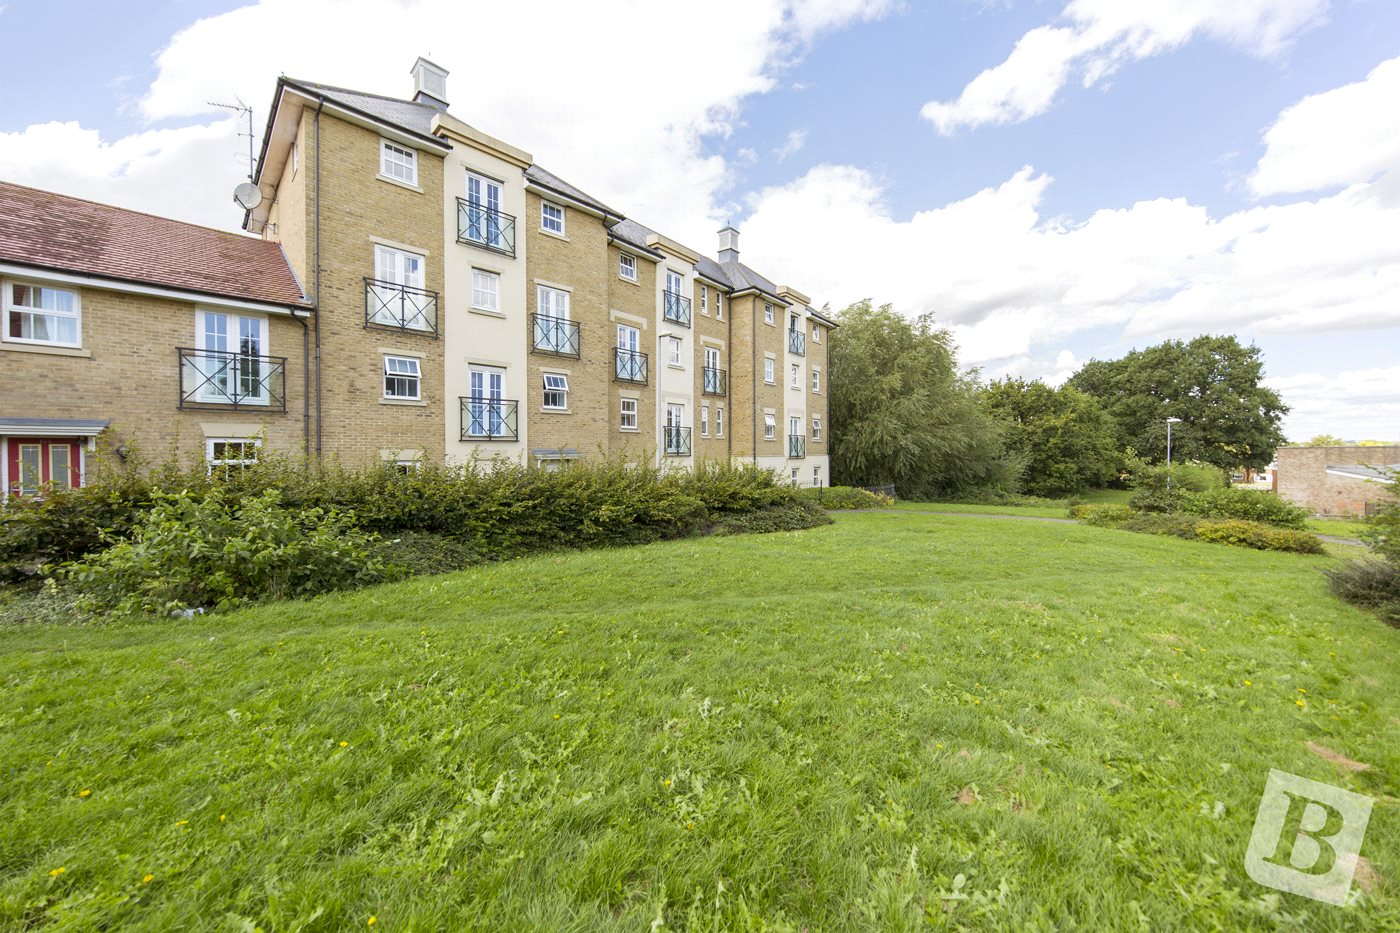 Rental Properties In Great Baddow